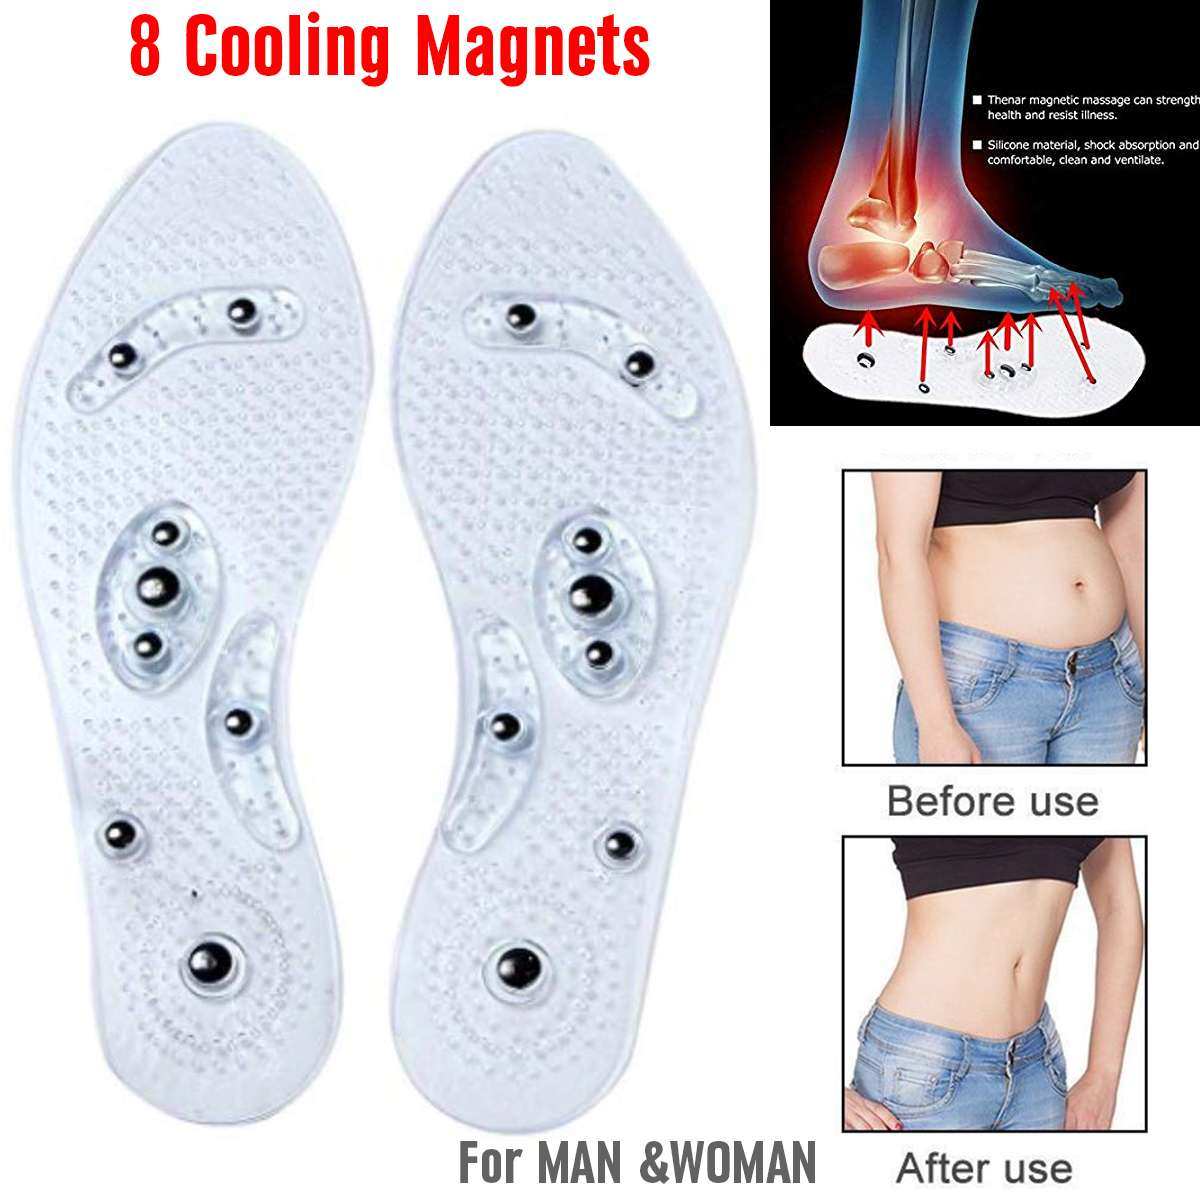 8 Magnets Acupressure Foot Massage Gel Insole Magnetic ...